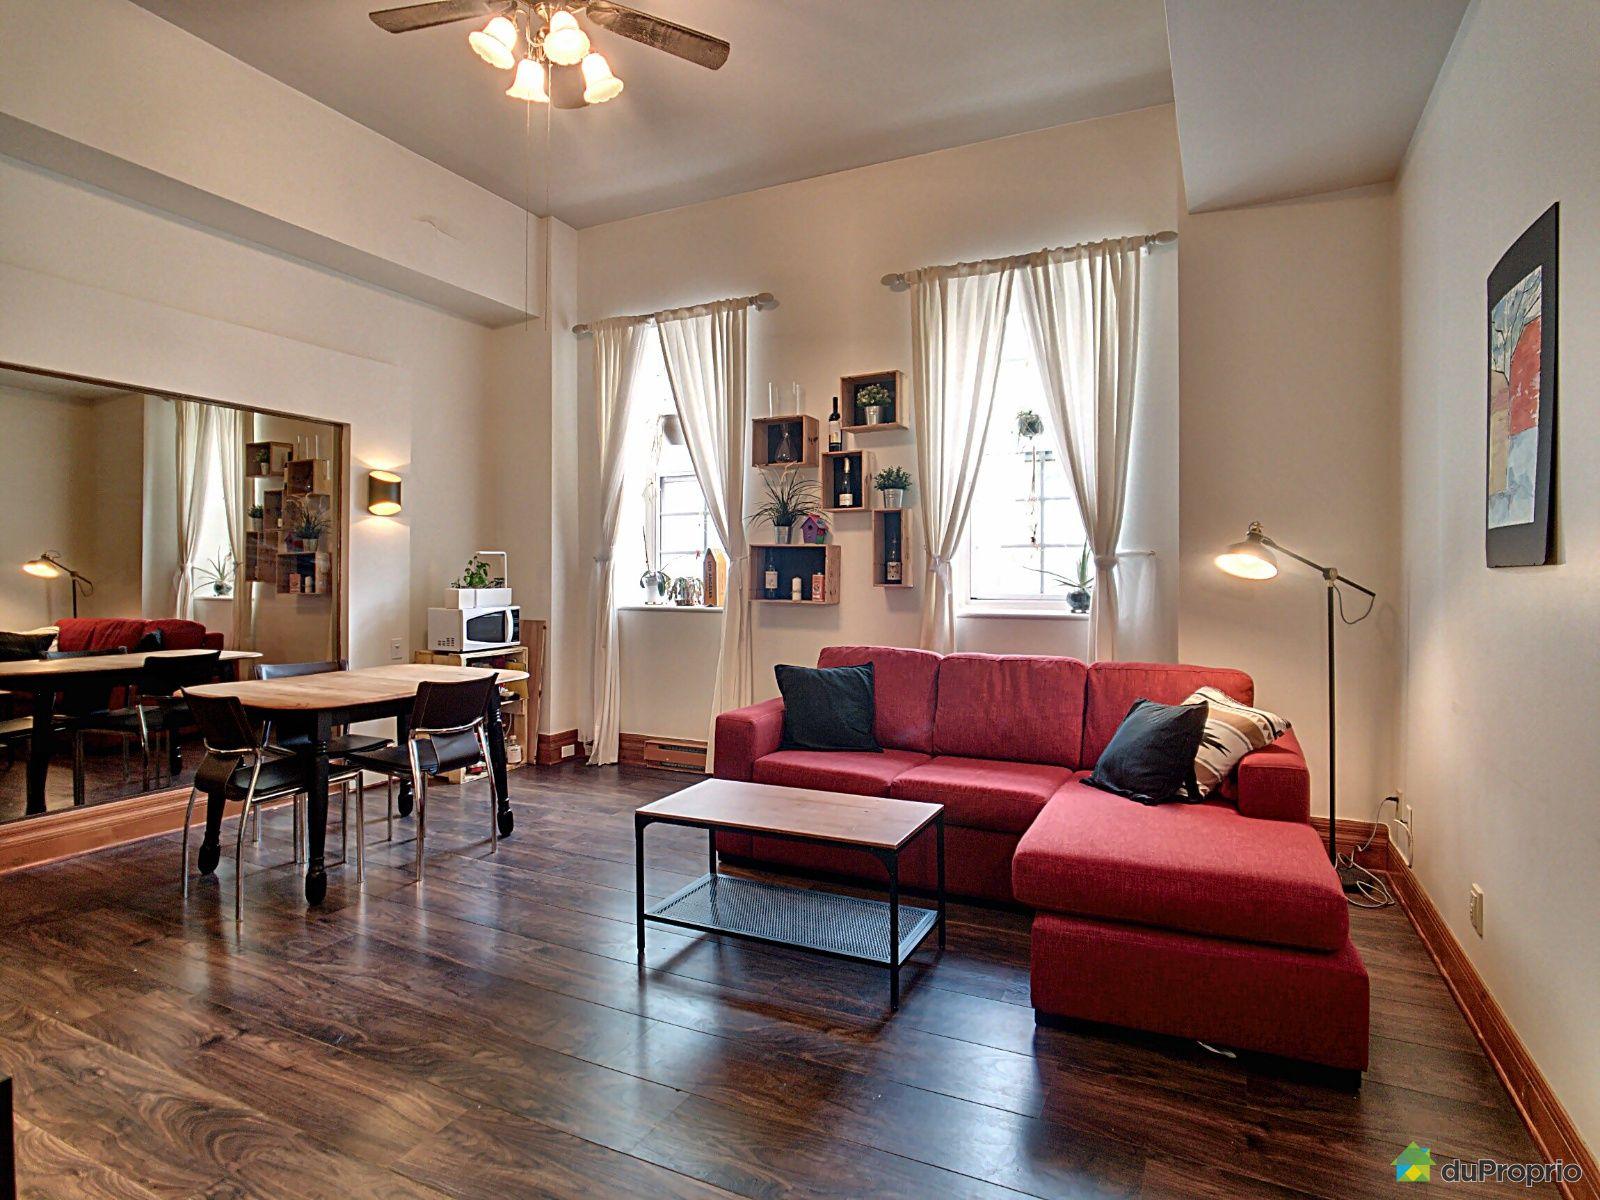 Living / Dining Room - 411-550 Grande Allée Est, Vieux-Québec for sale